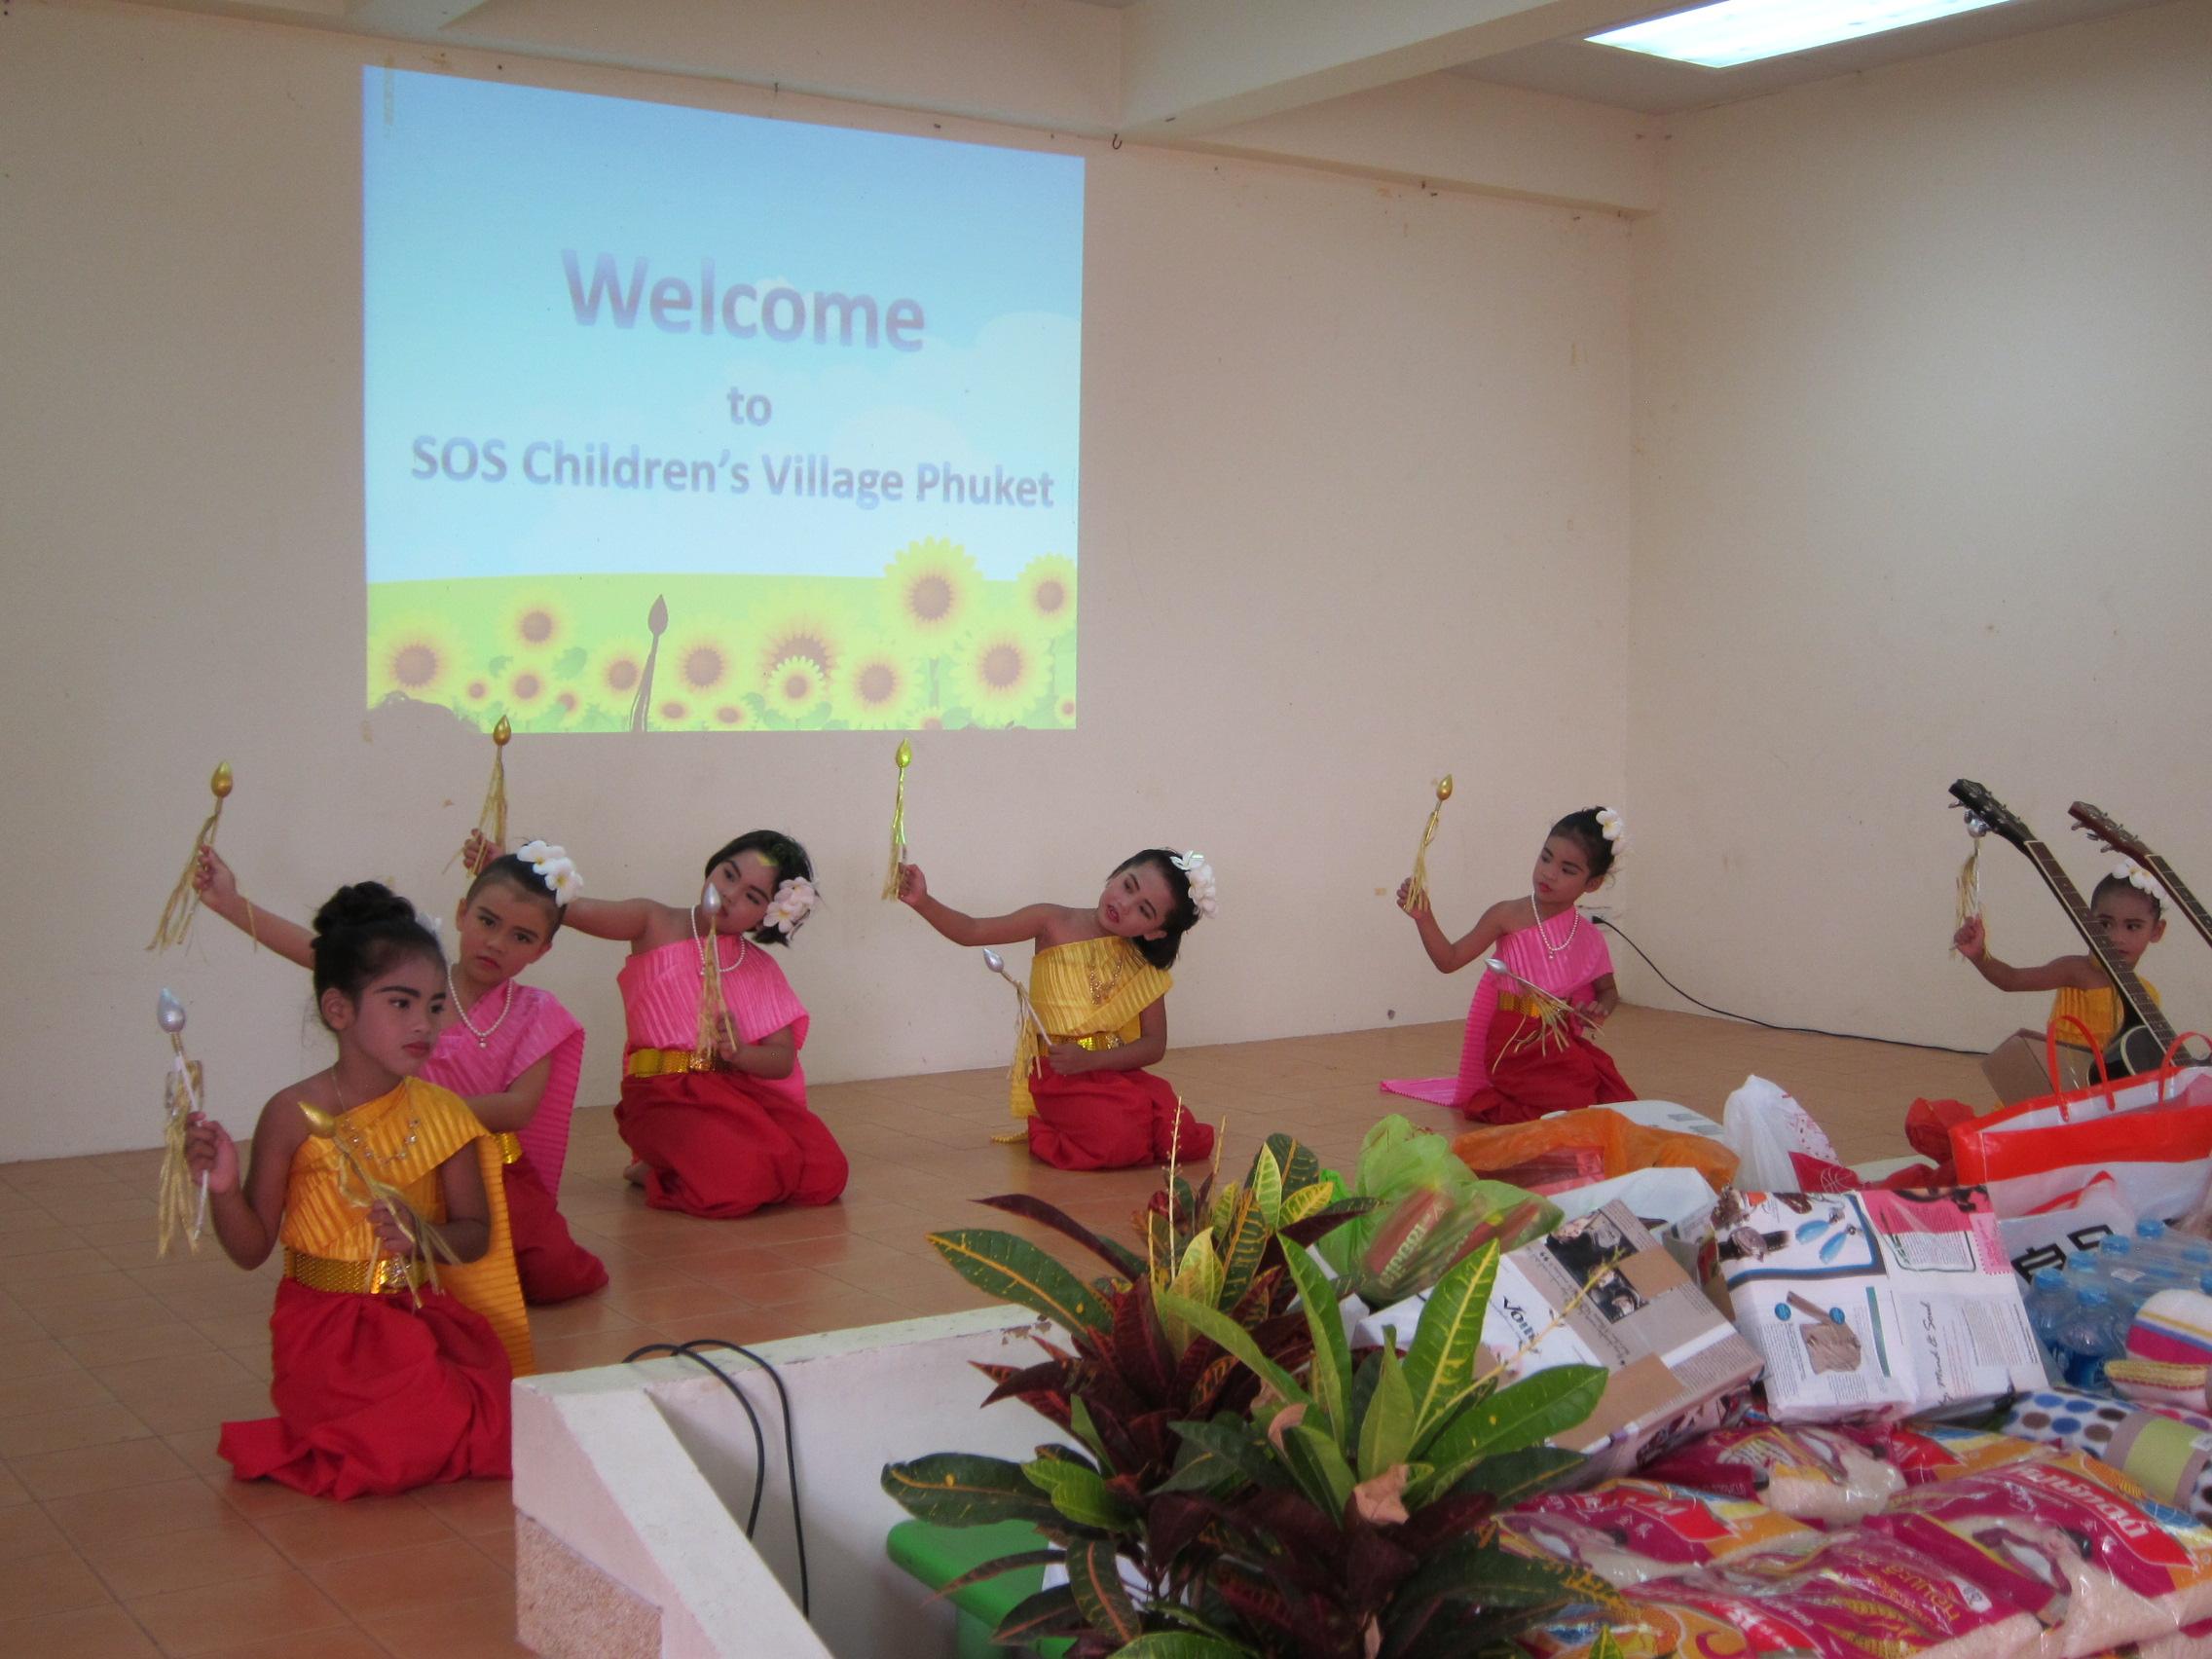 Thai Girls Doing Traditional Dance